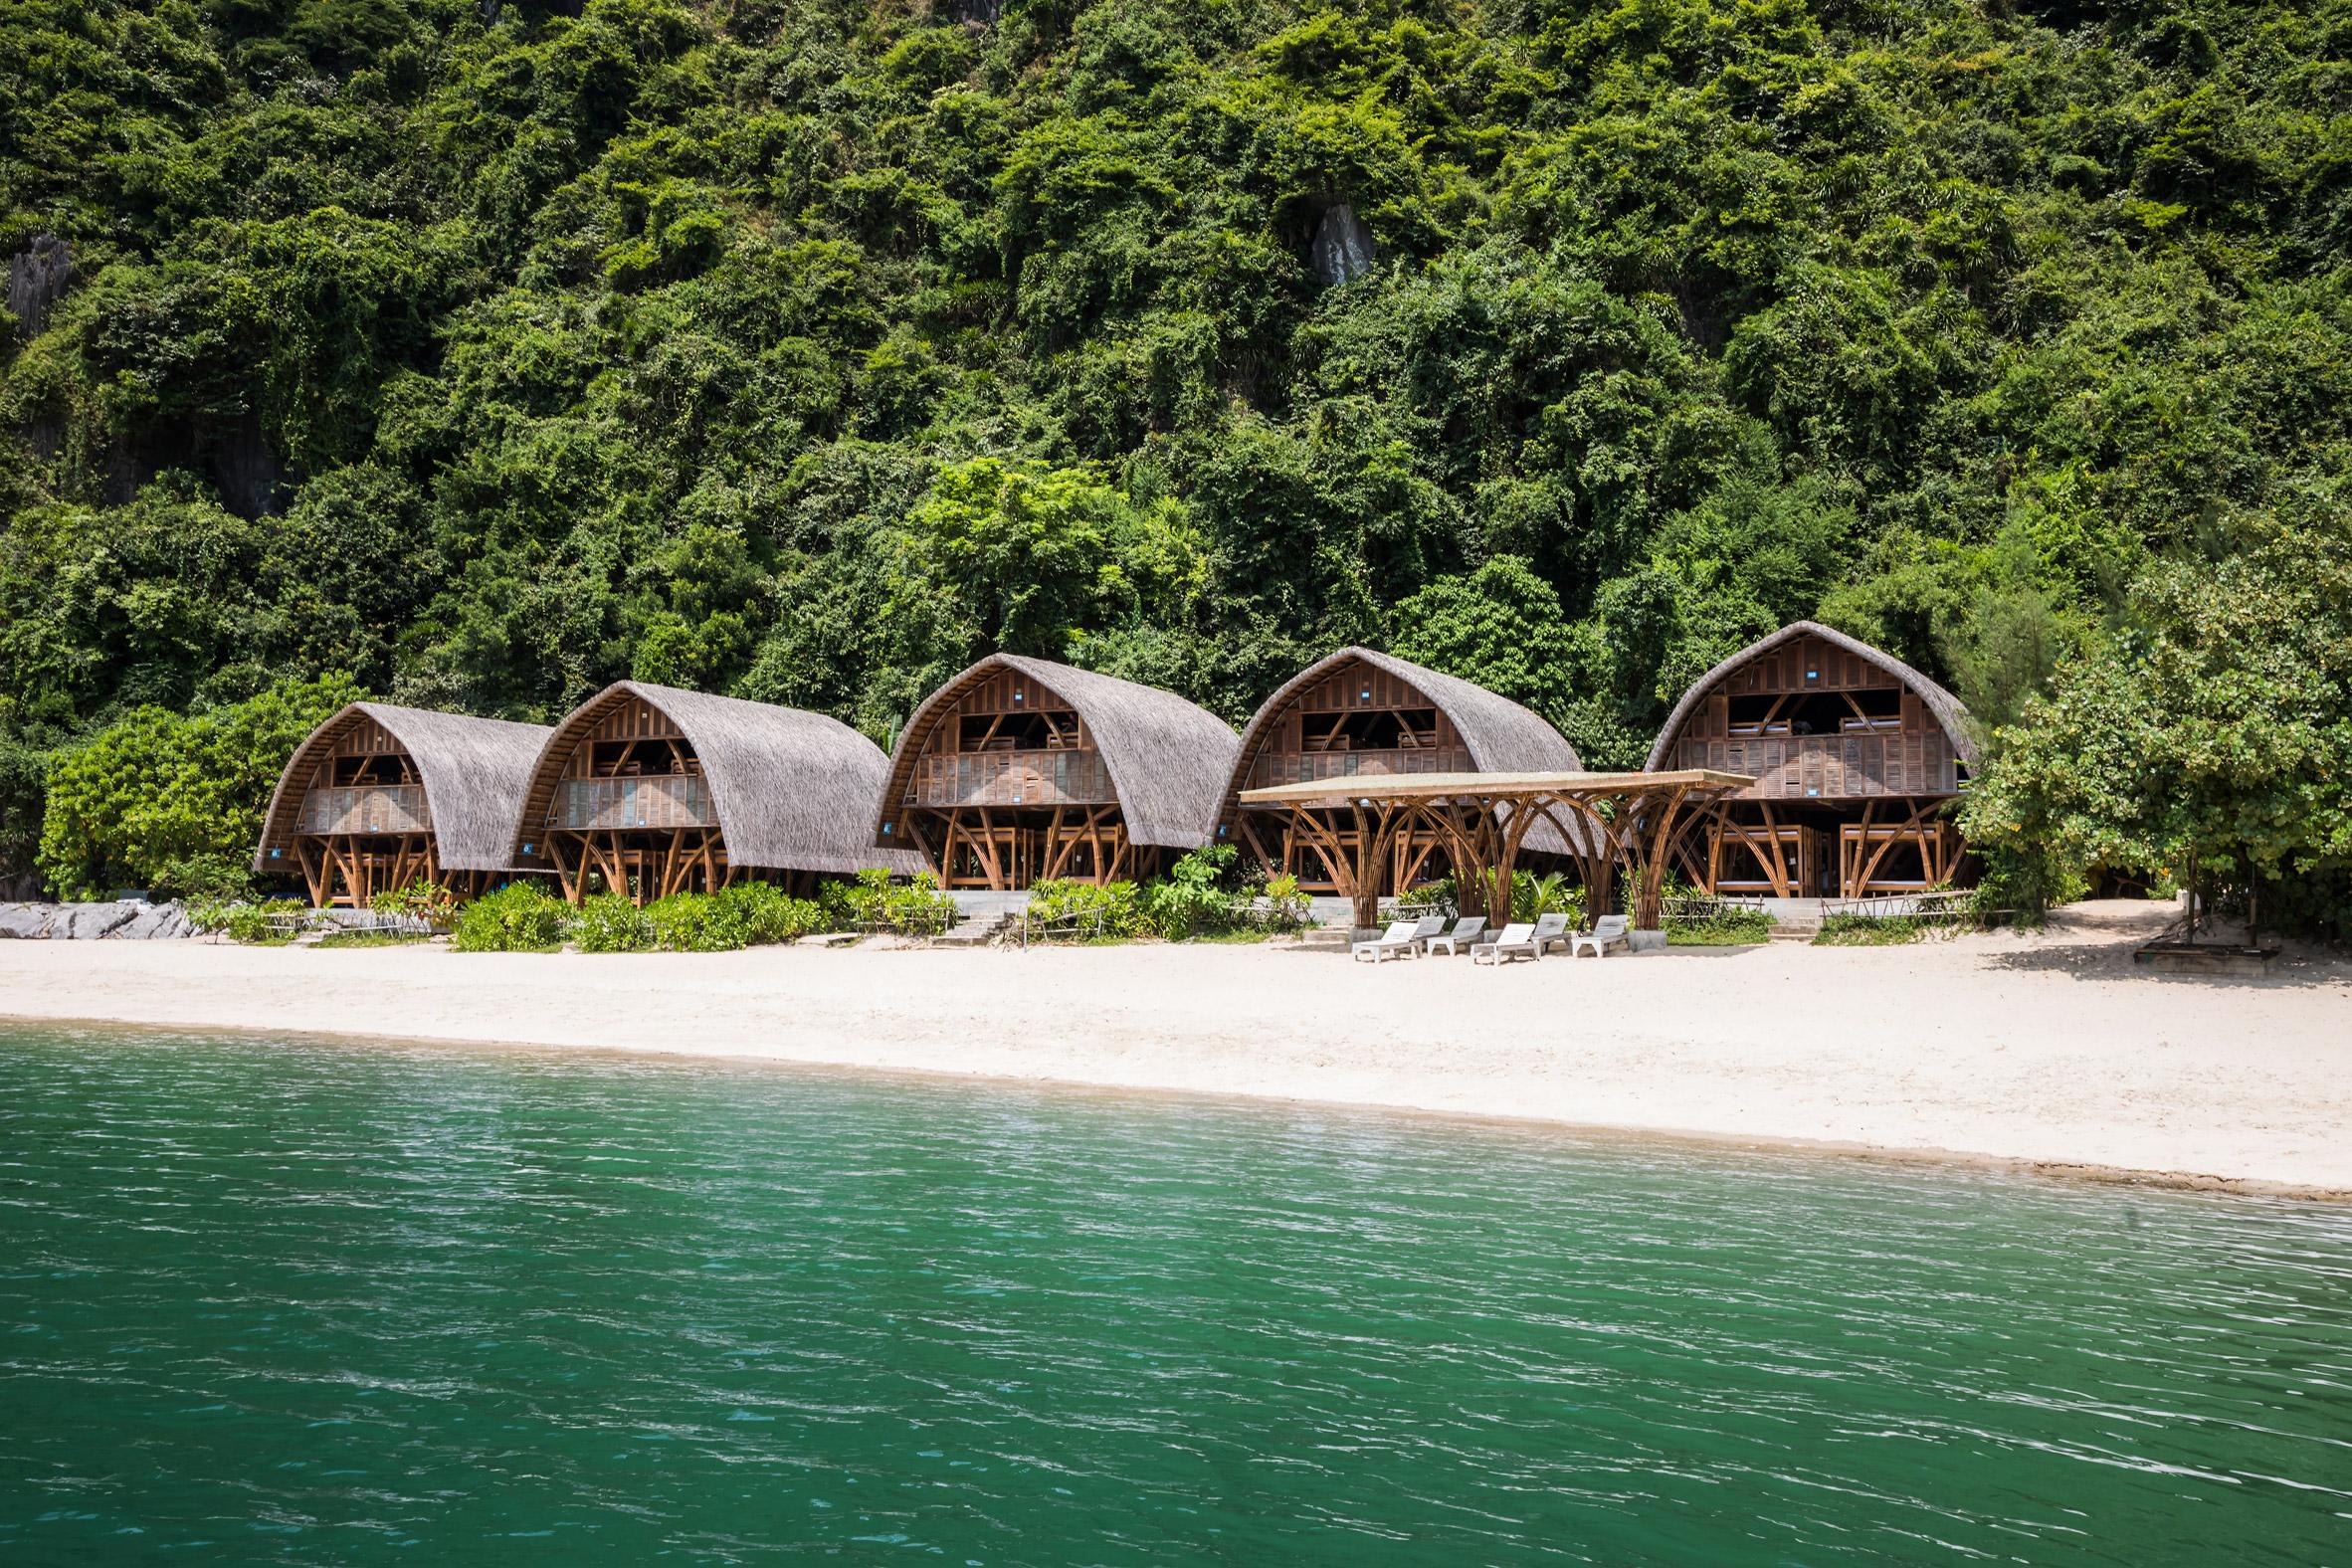 Thiết kế Resort biển 12